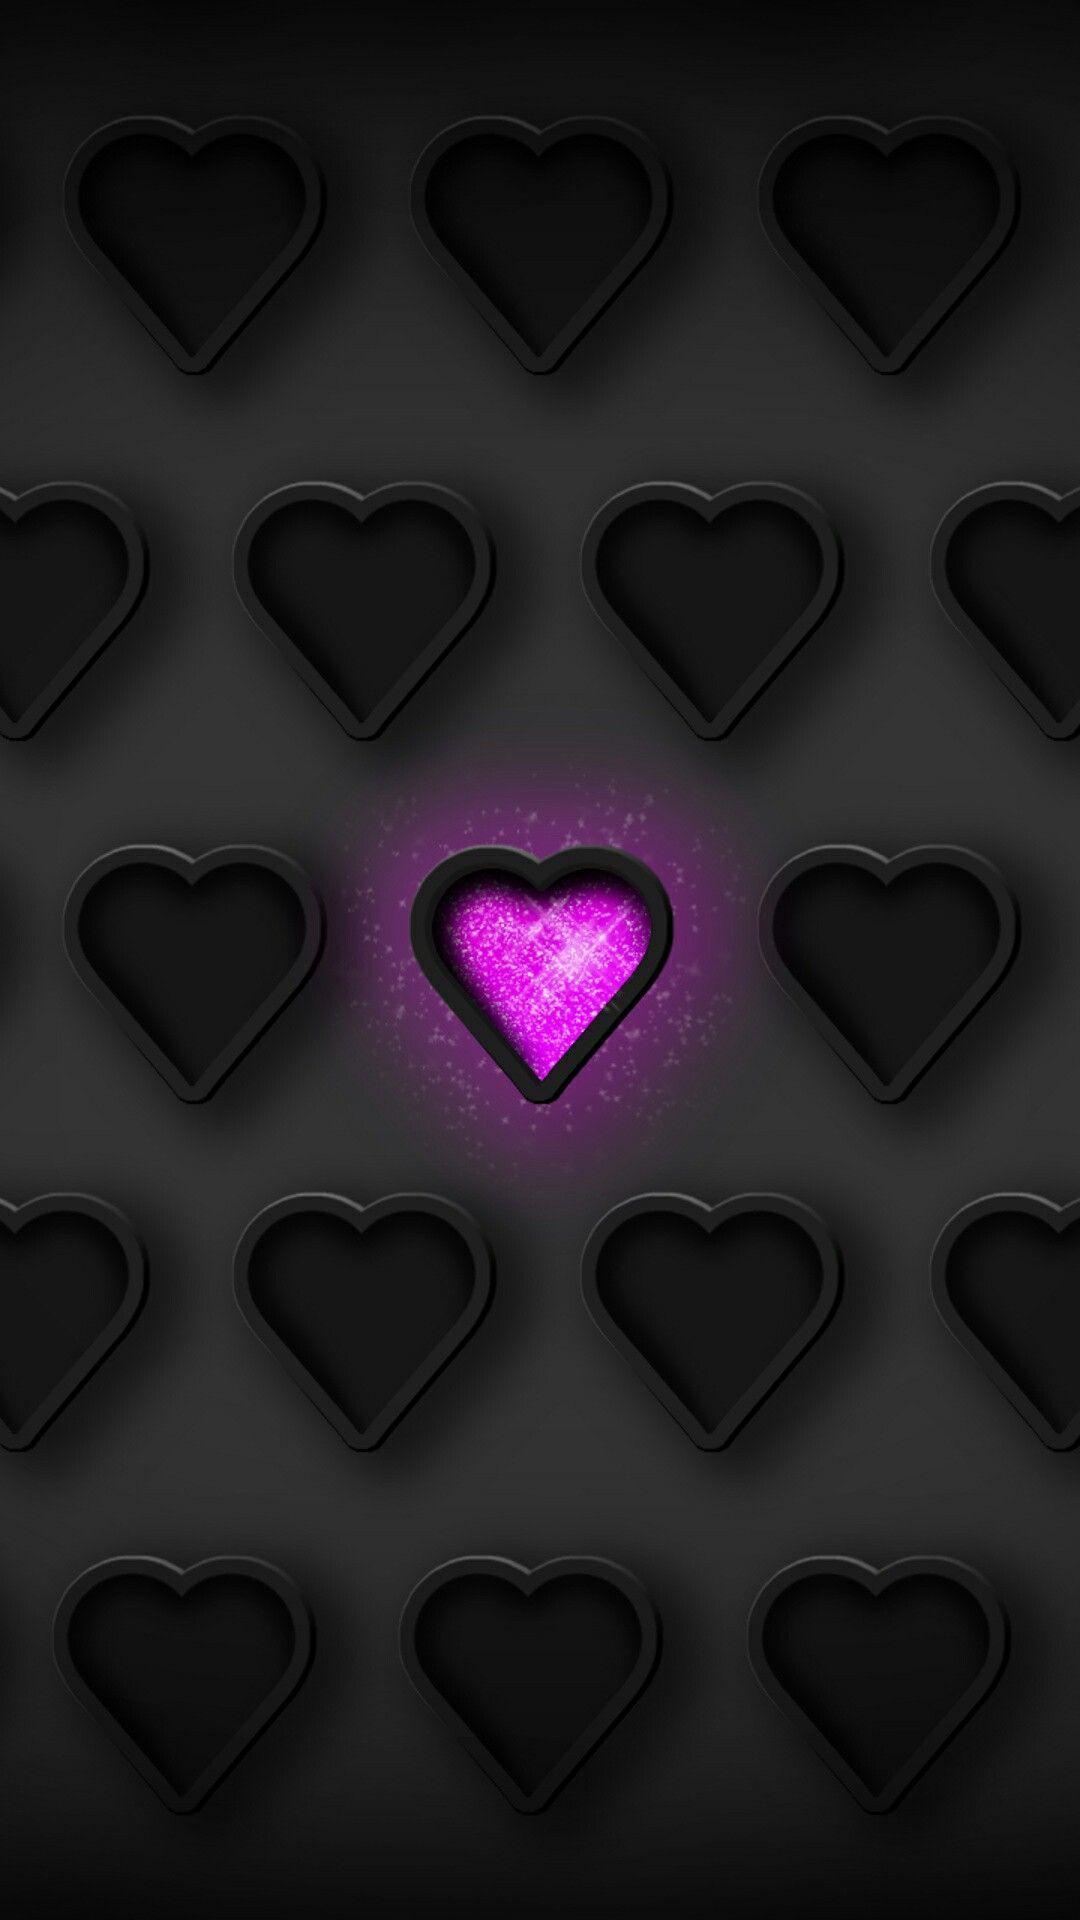 Download Wallpaper Broken Heart Pinterest HD